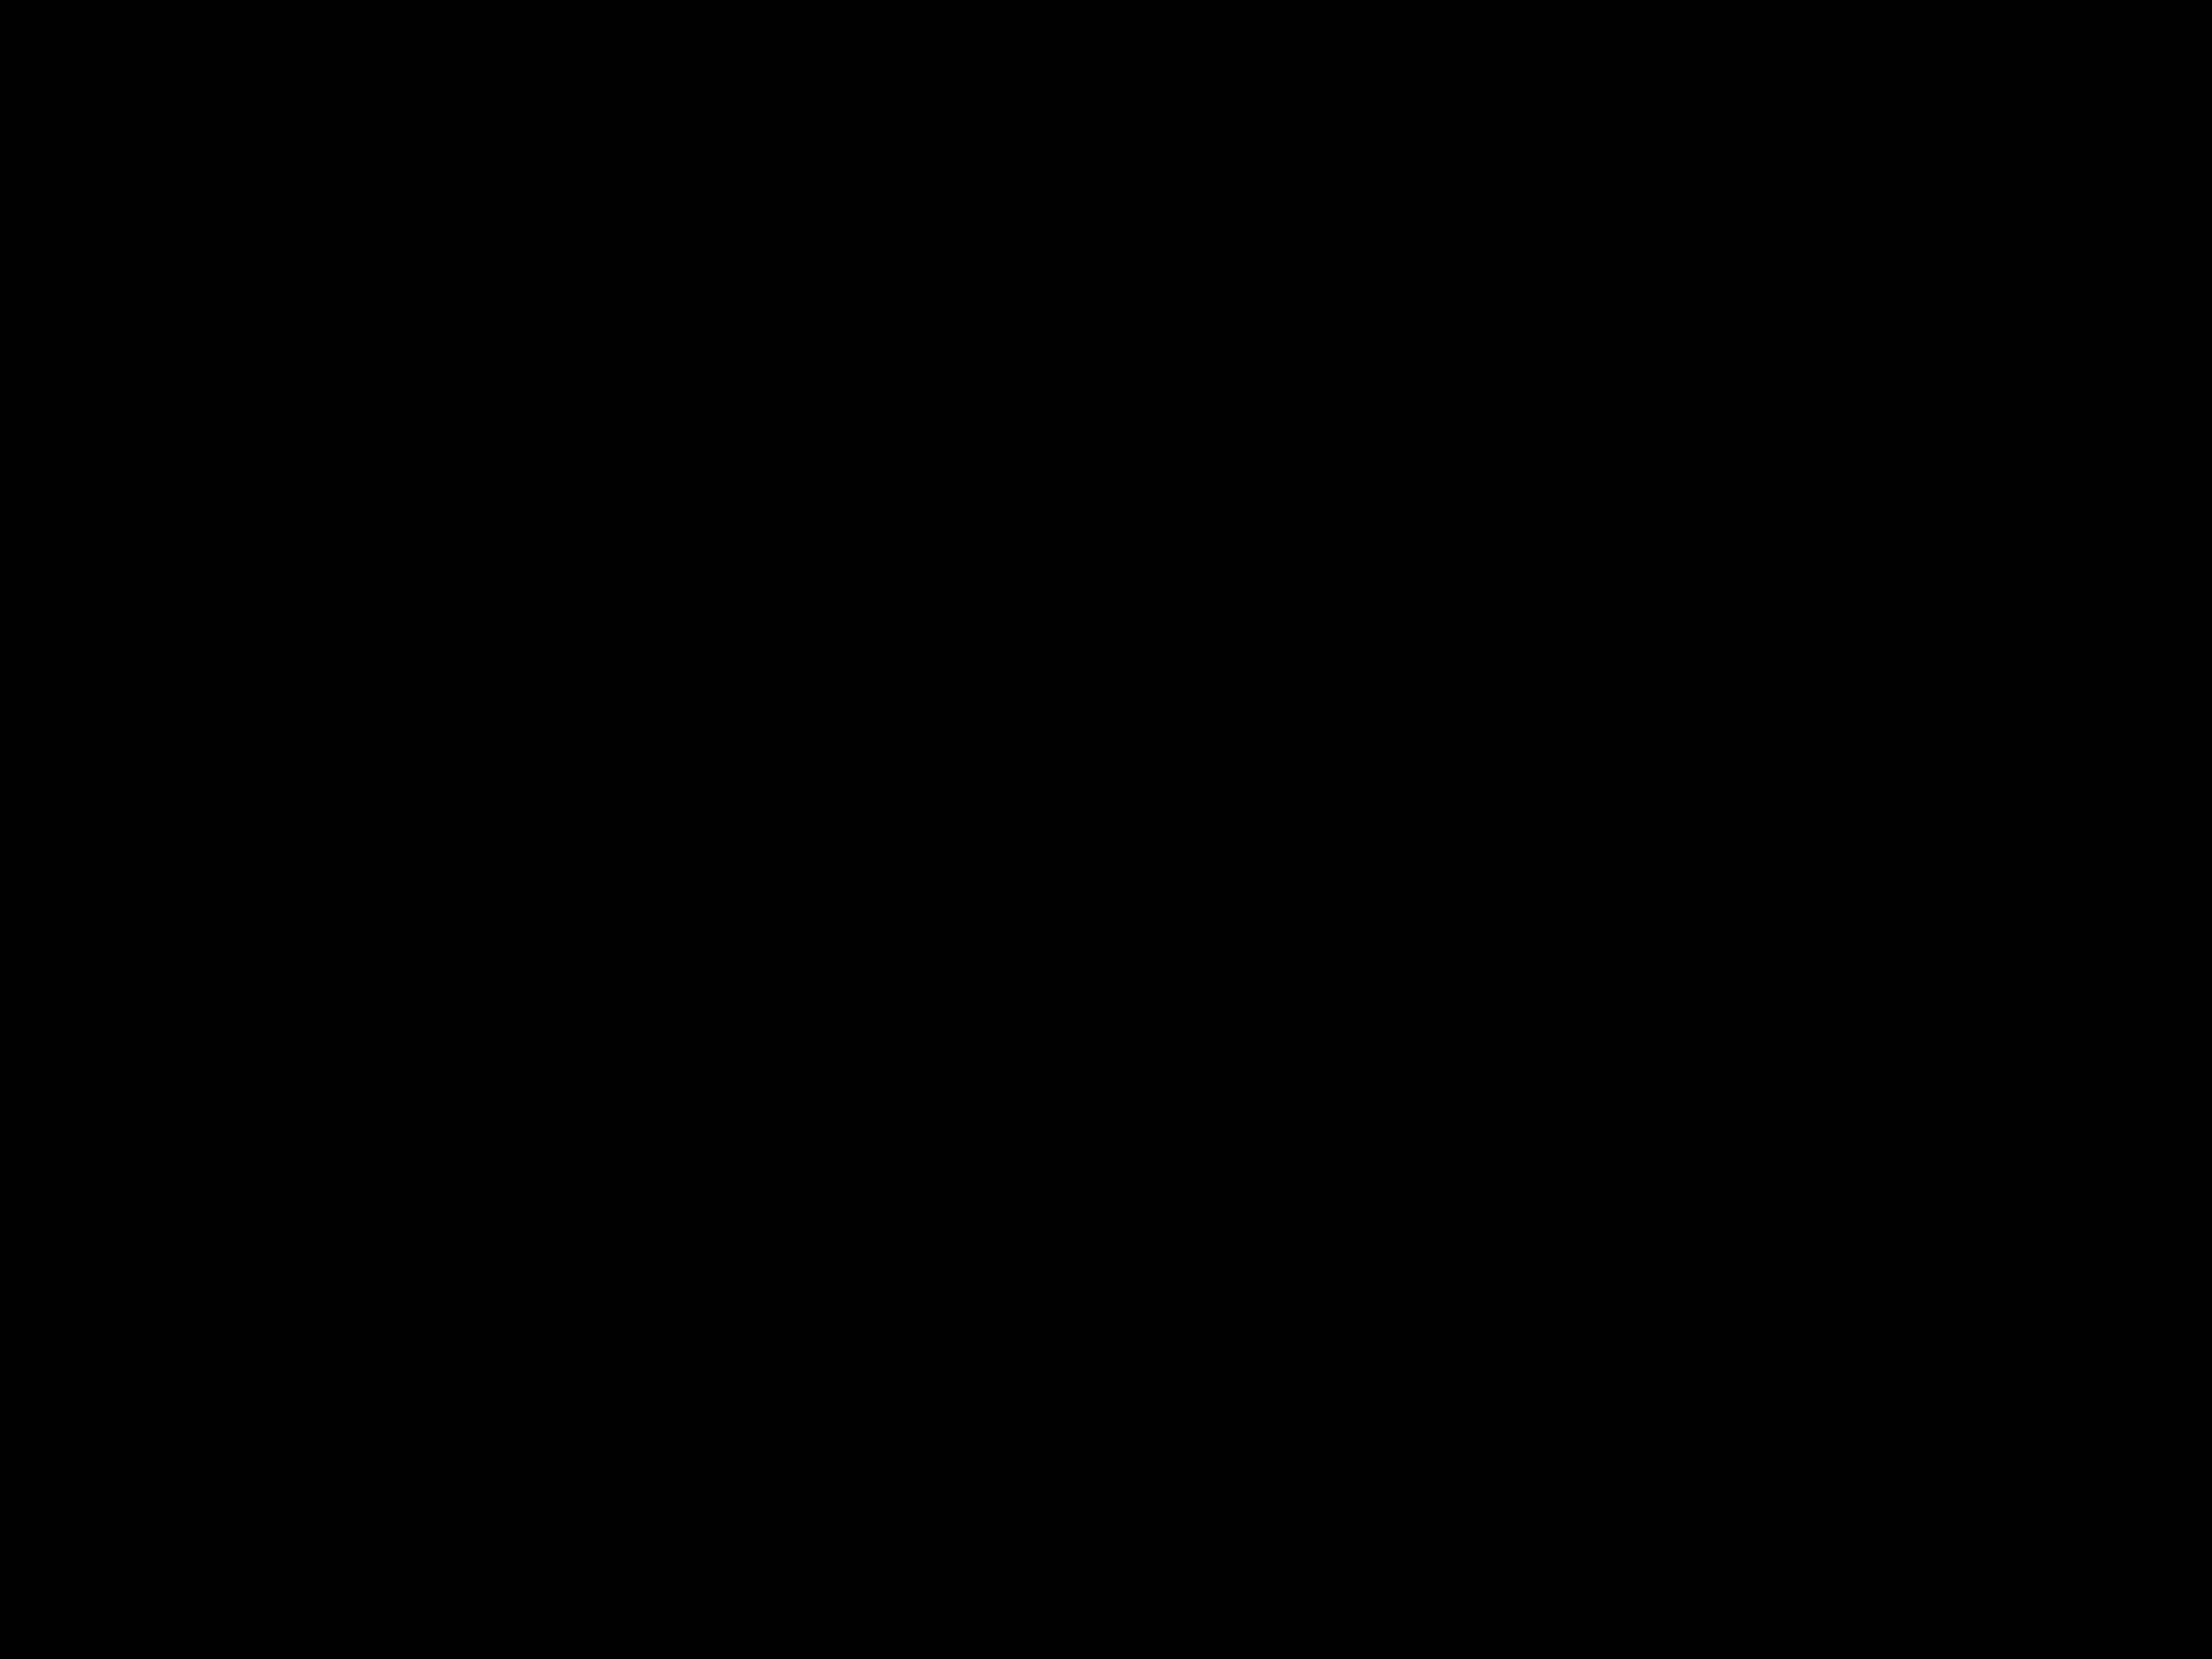 Calvin Klein Logo Transparent Image